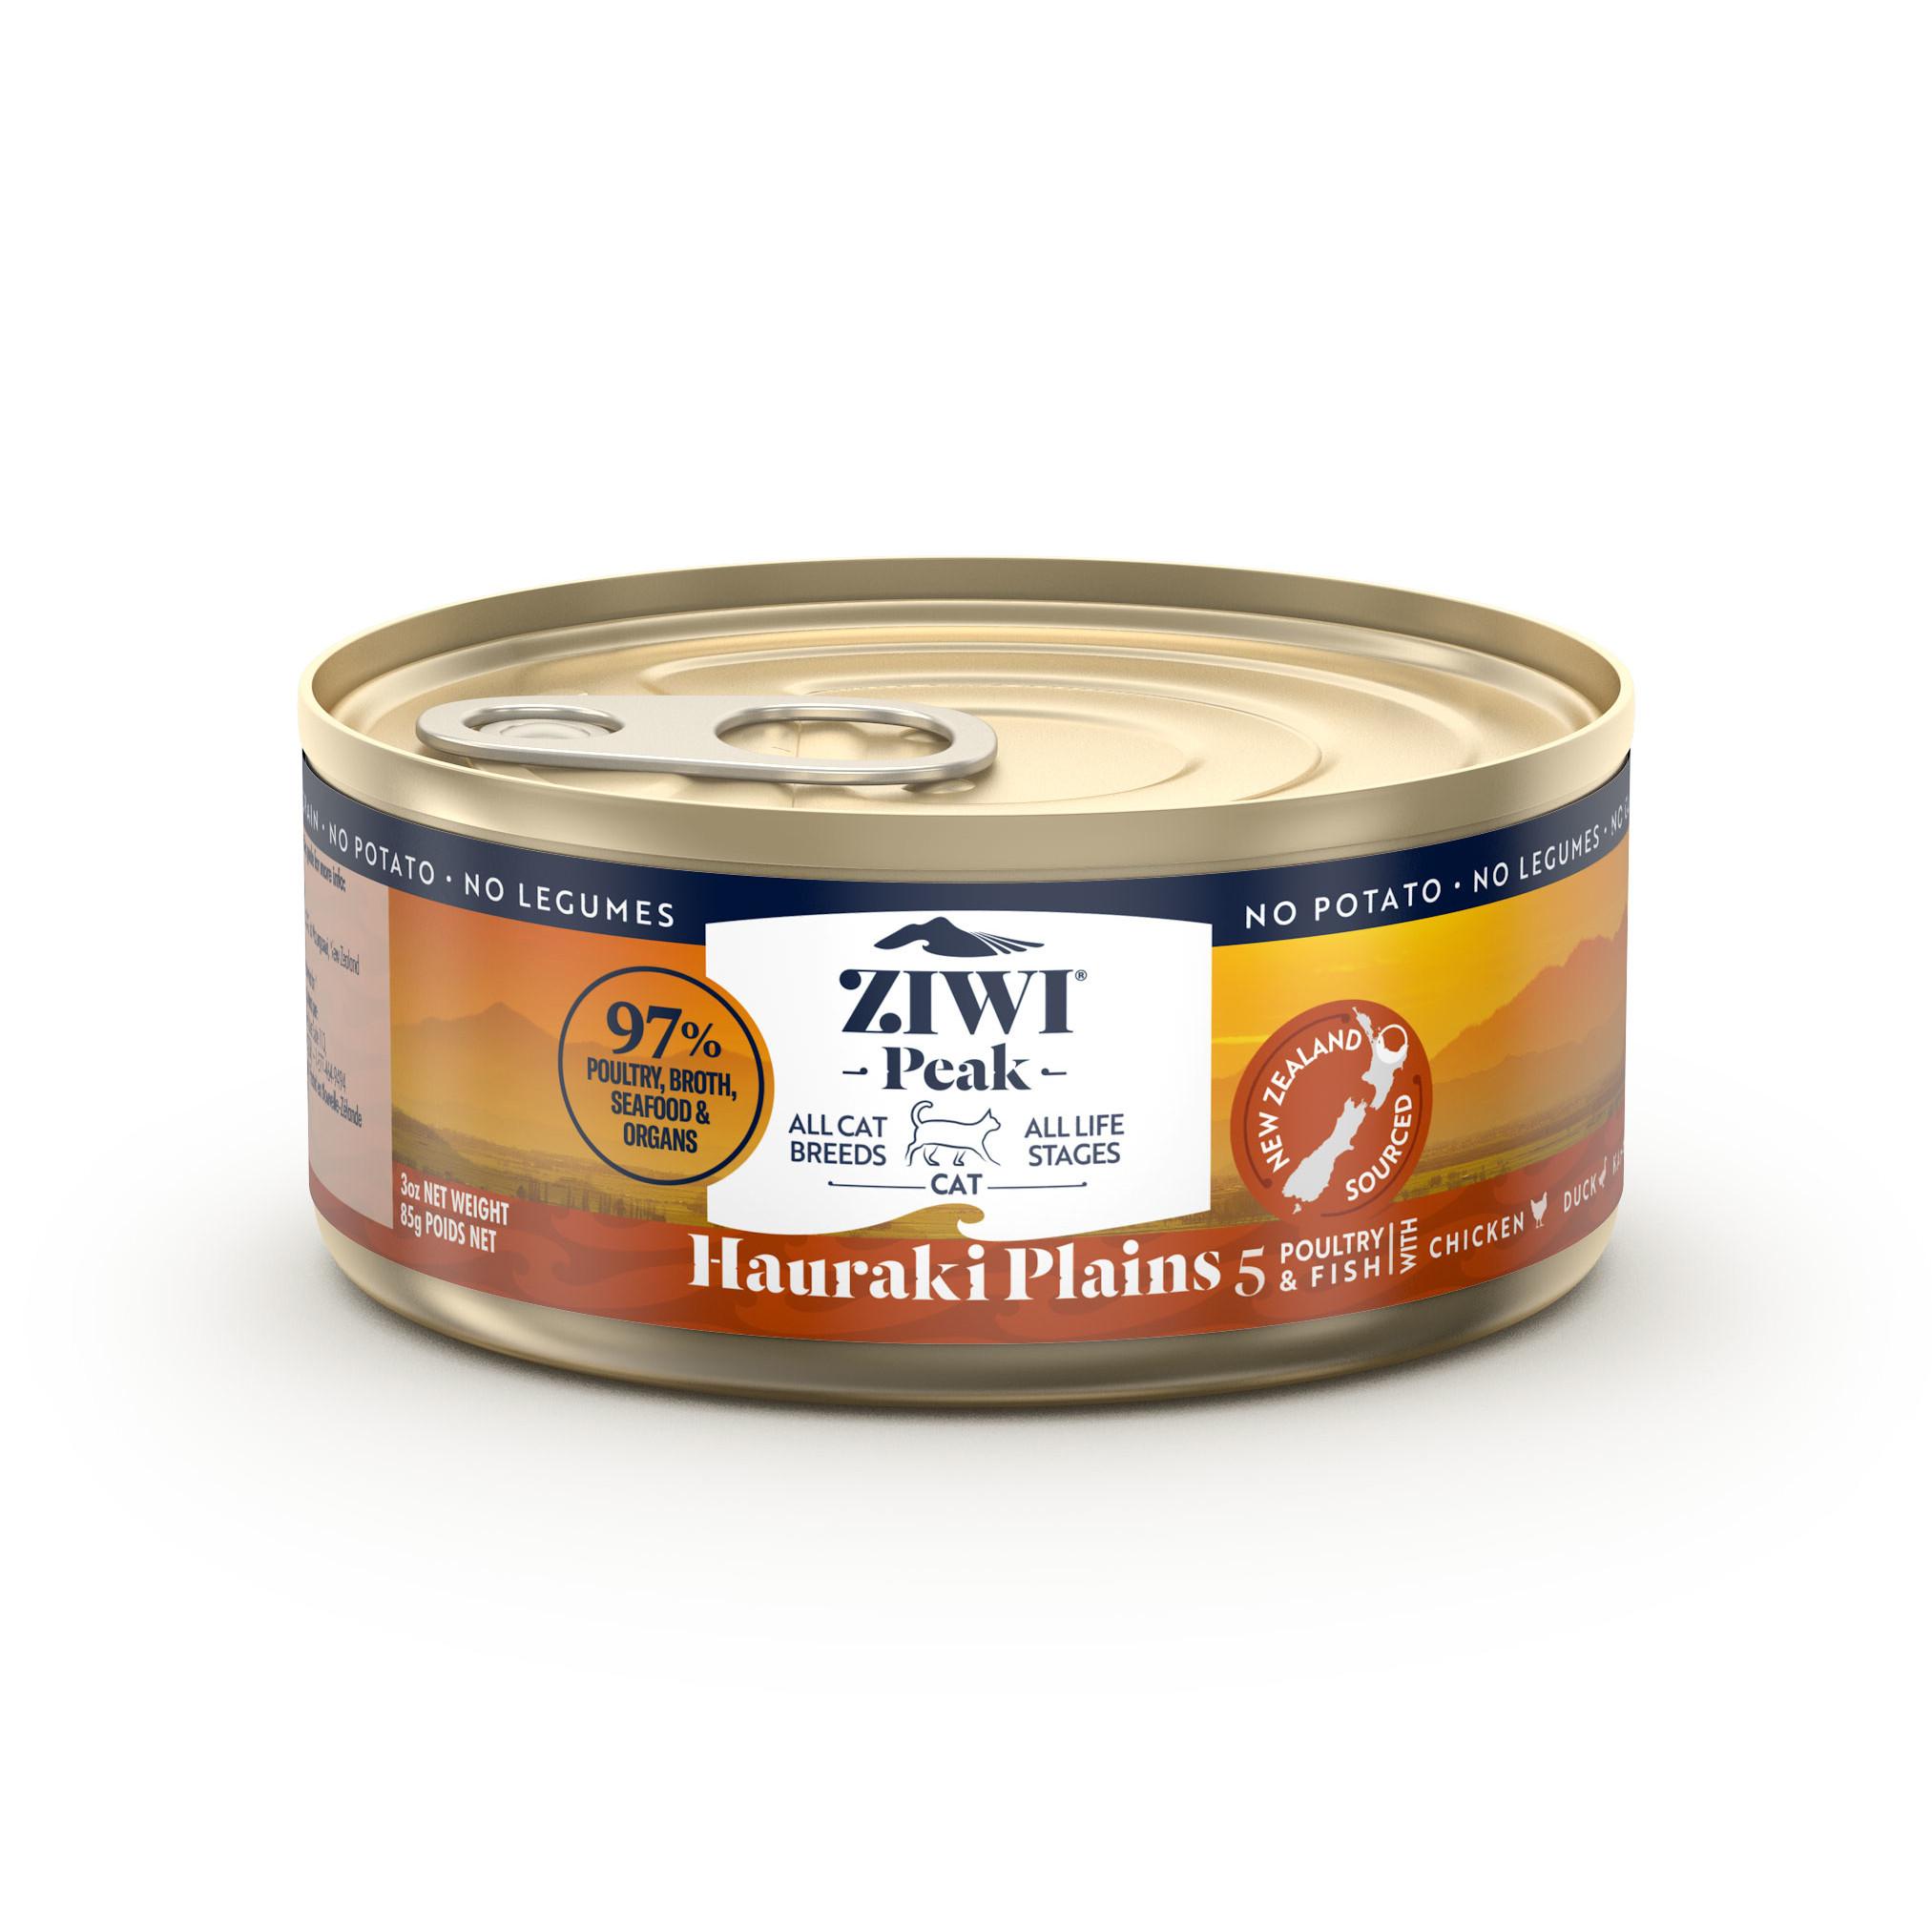 ZIWI Peak Provenance Canned Cat Food Hauraki Plains Recipe, 170-g